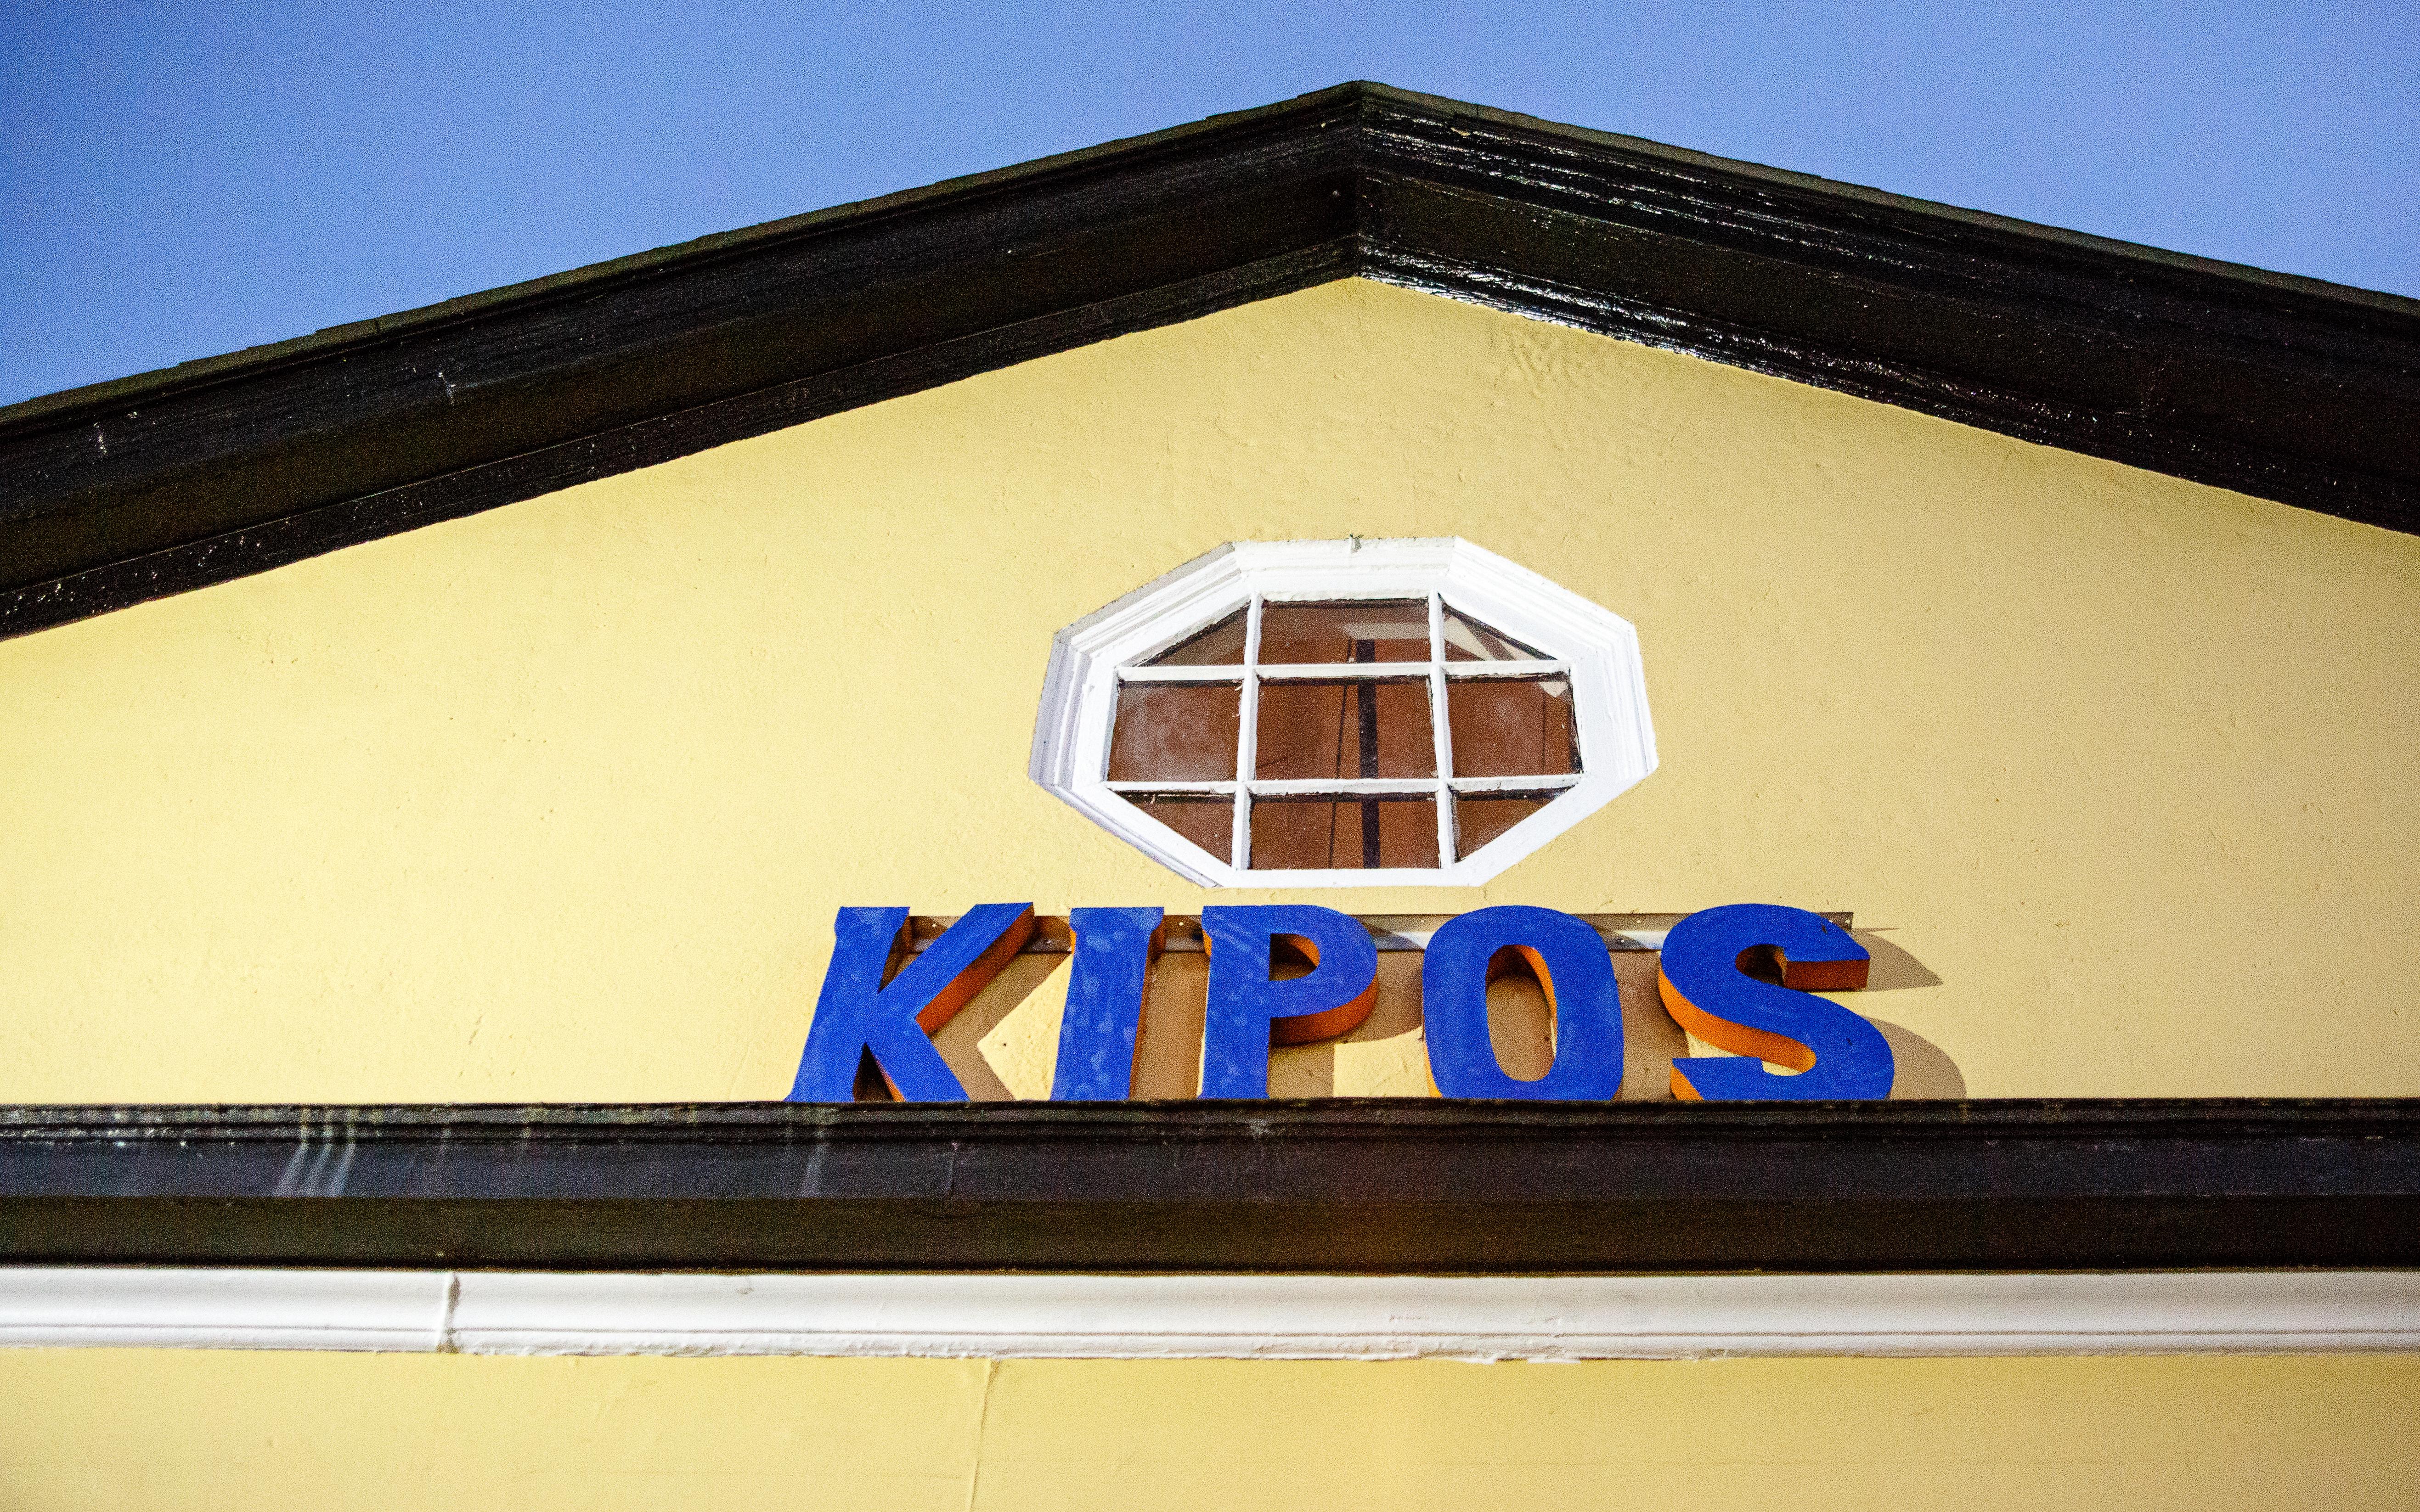 Event @ Kipos 2015